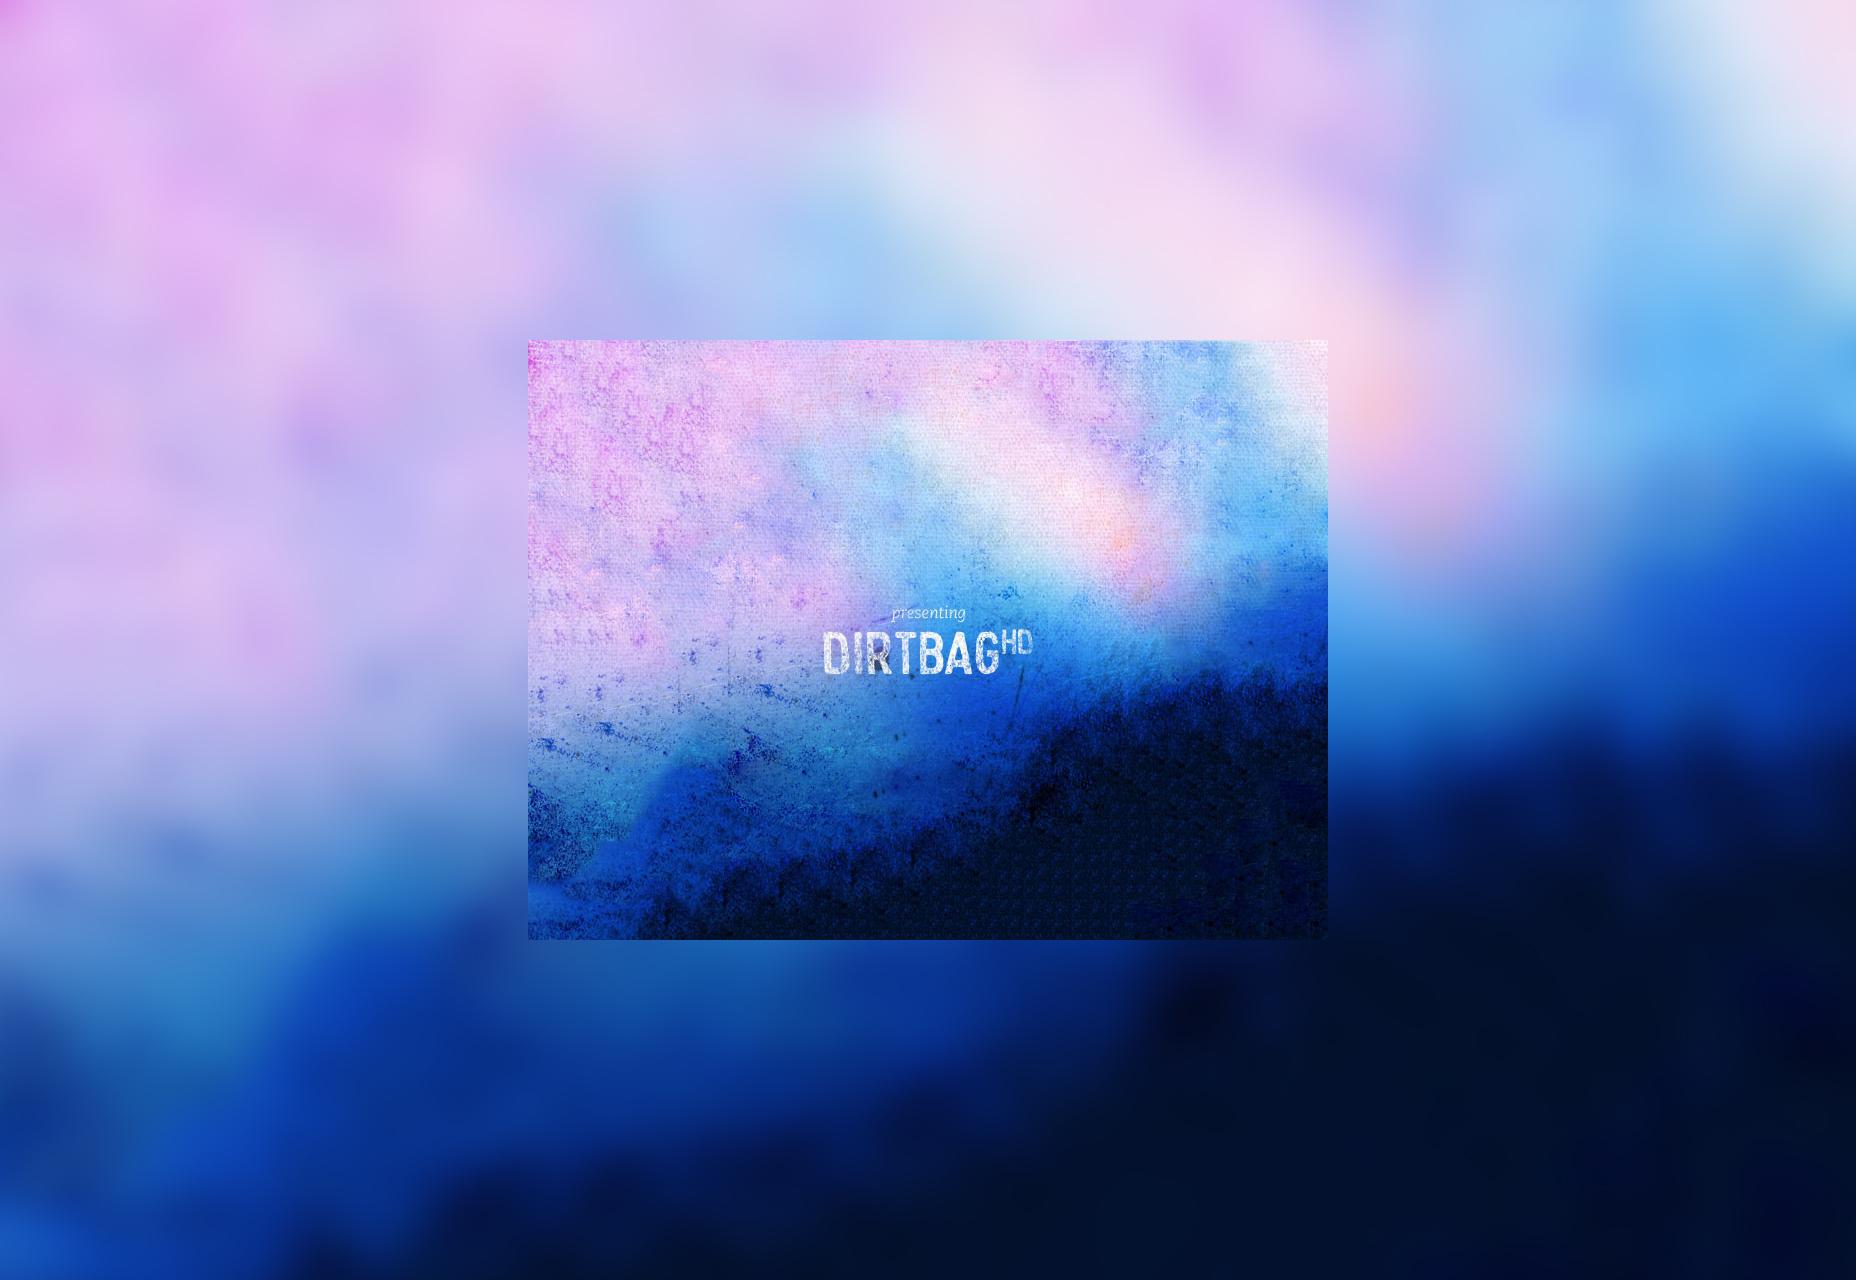 dirtbag-15-hd-grunge-psd-brushes-set